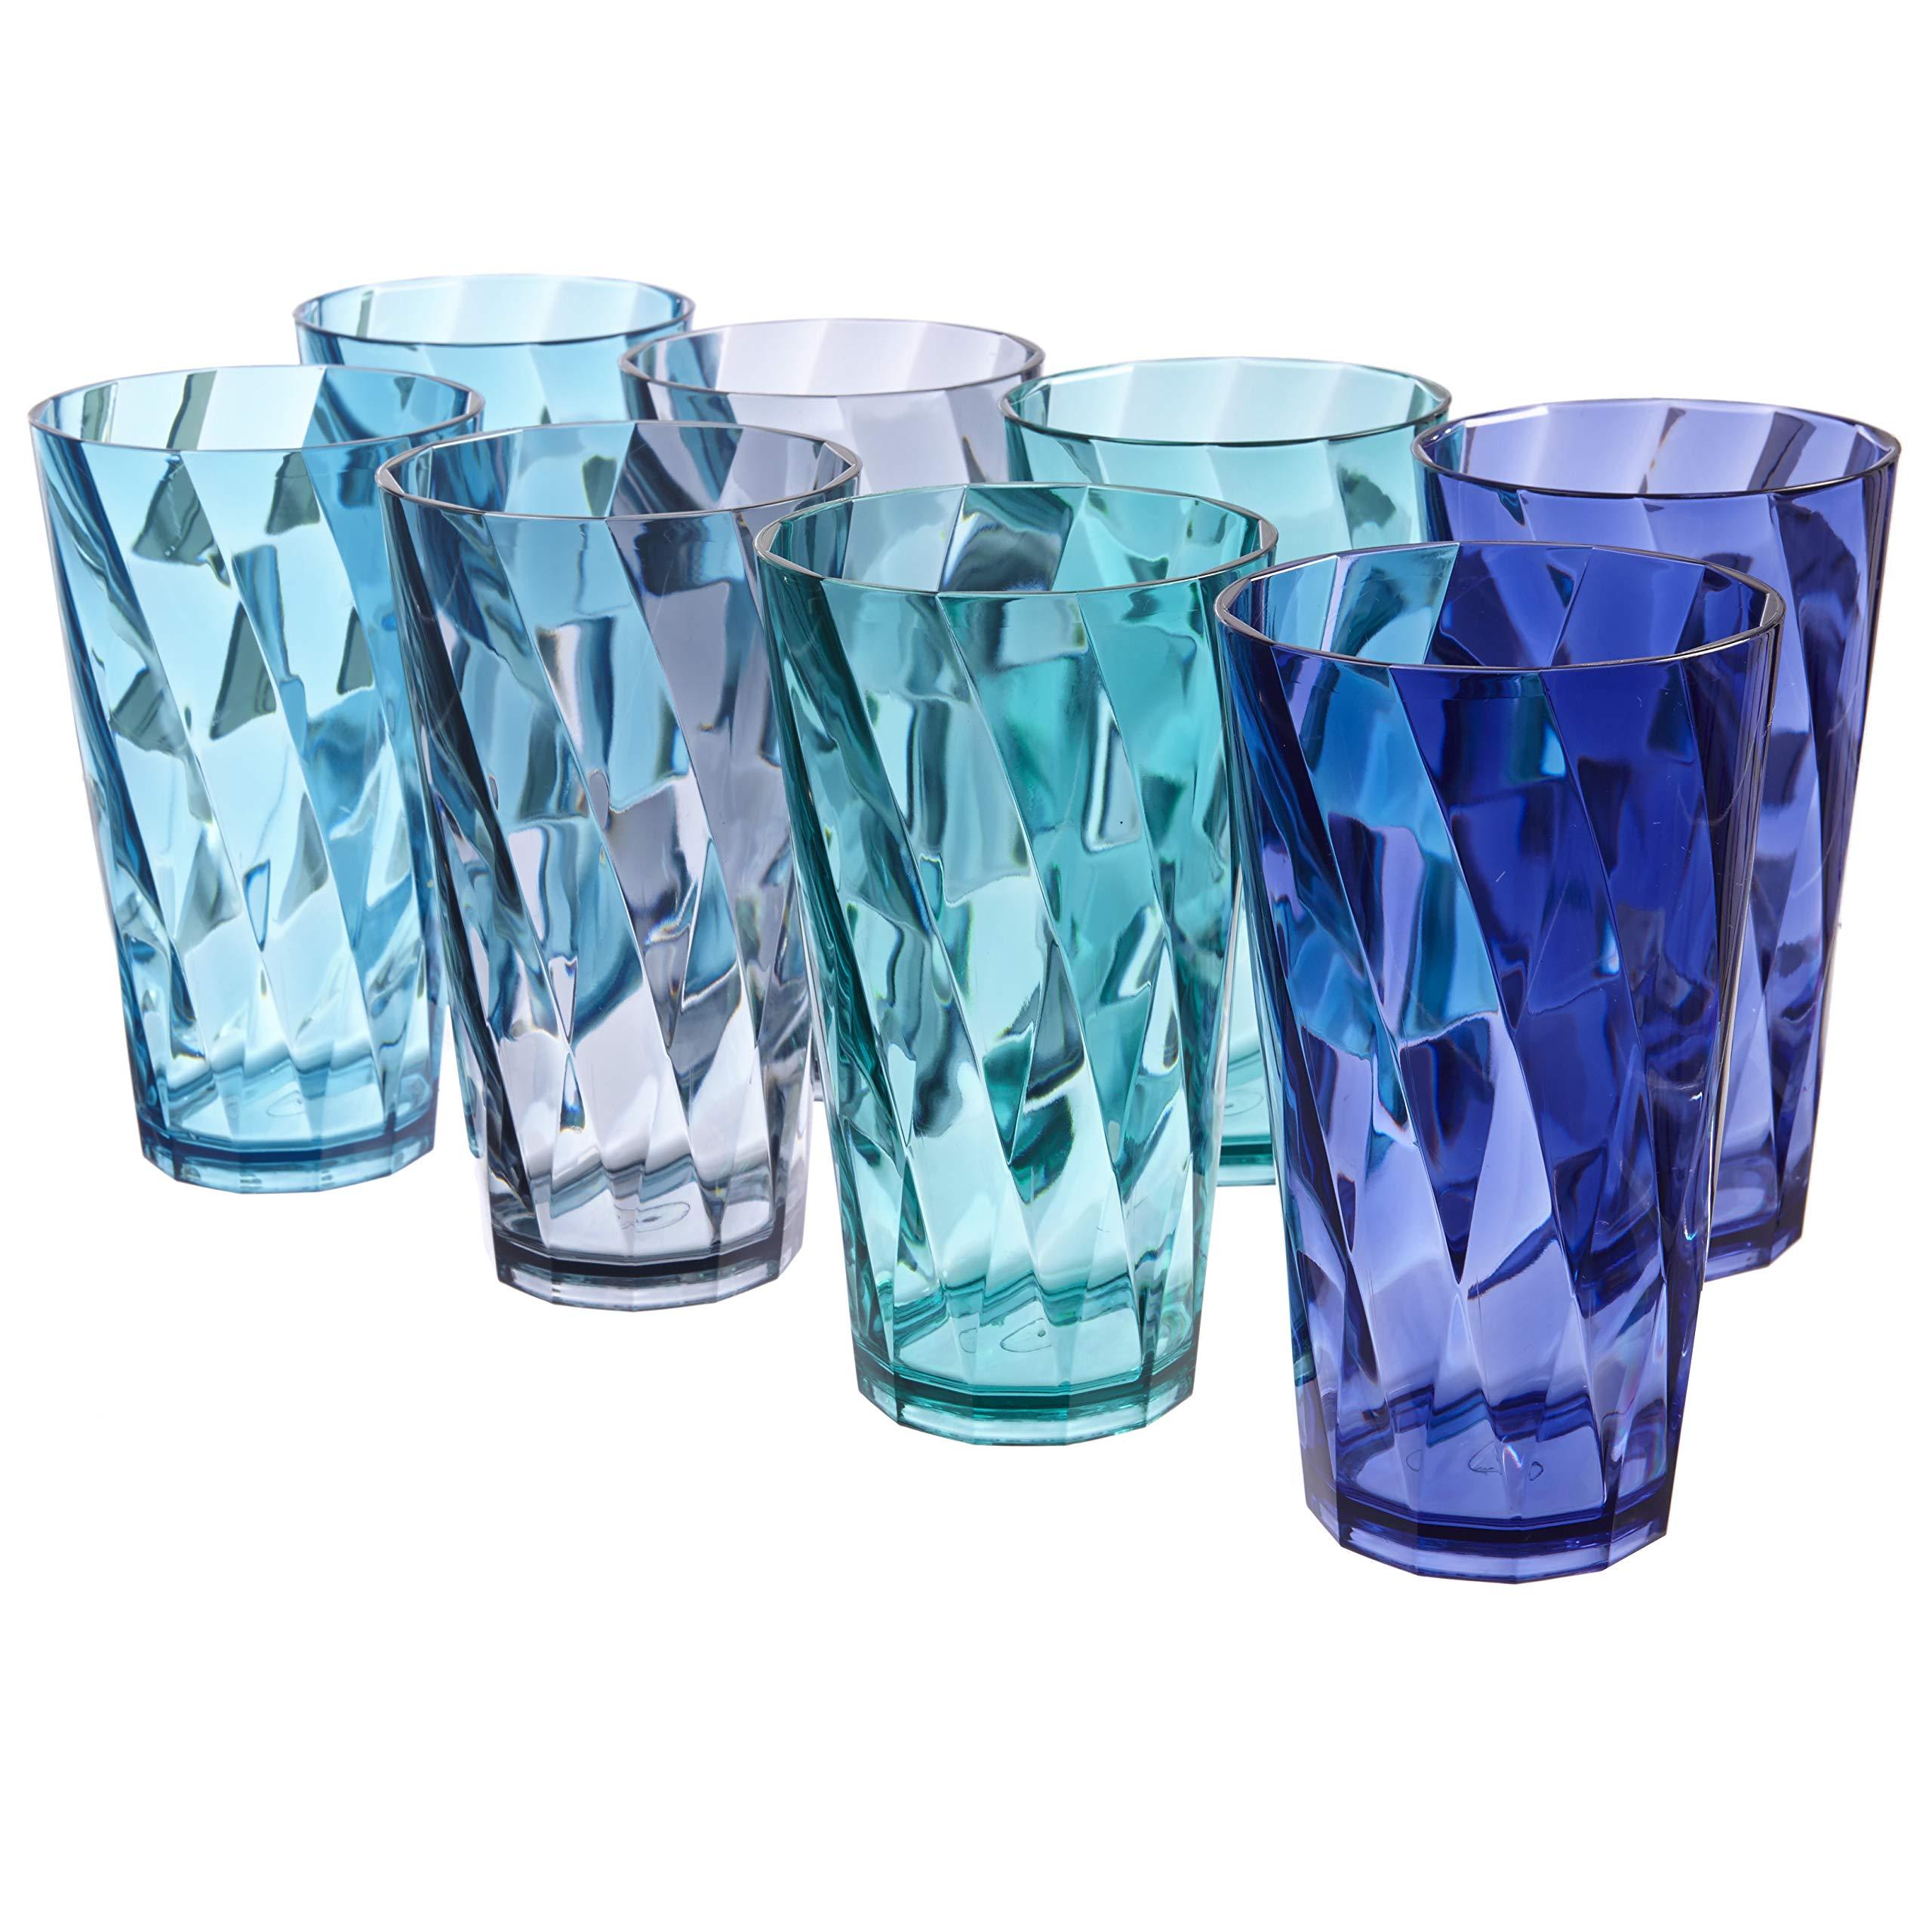 Optix 20-ounce Plastic Tumblers | set of 8 in 4 Coastal Colors by US Acrylic